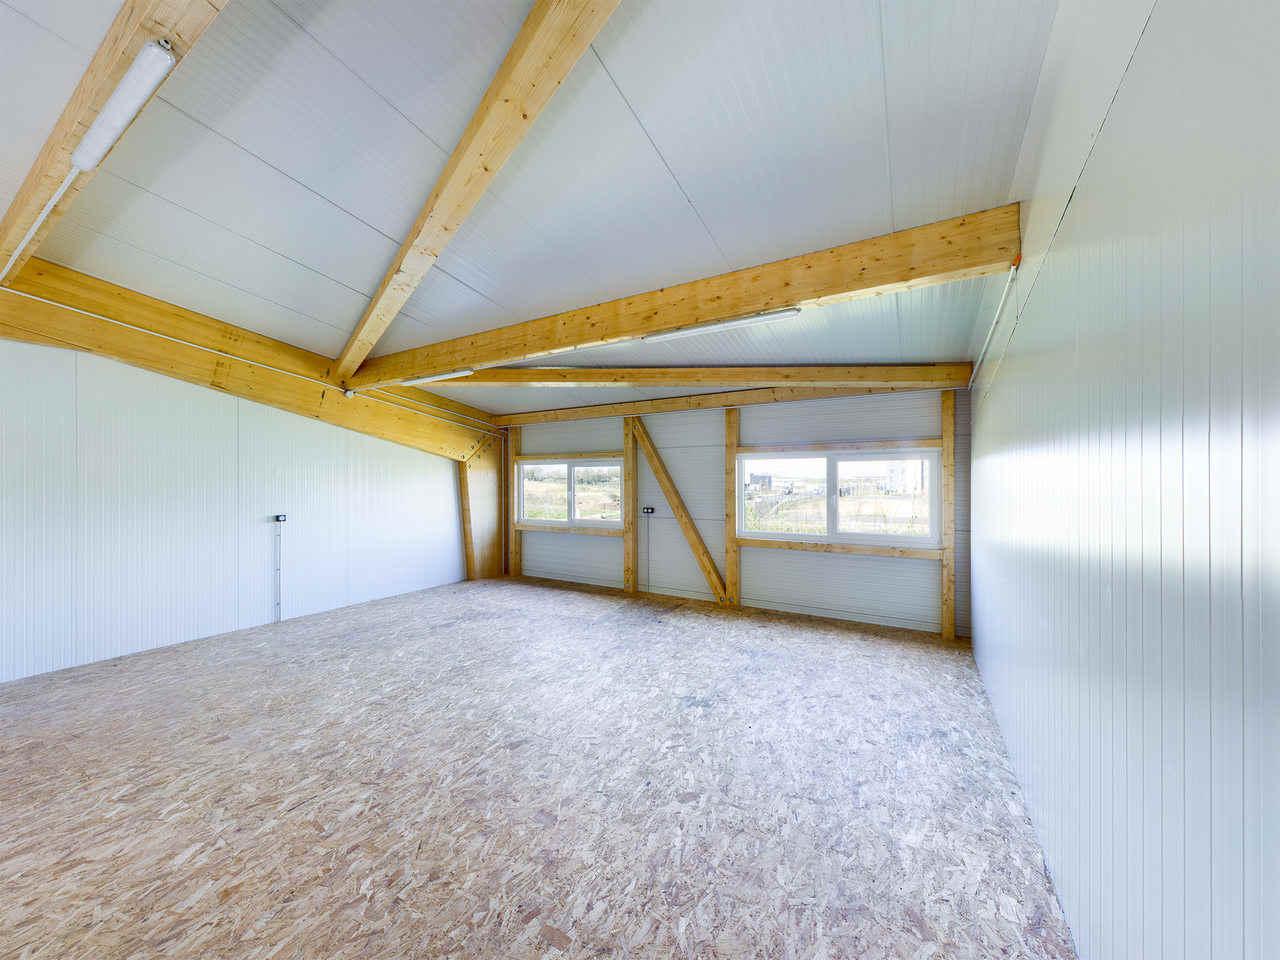 mezzanine-stockage24-stockage-louer-stockage-location-box-louer